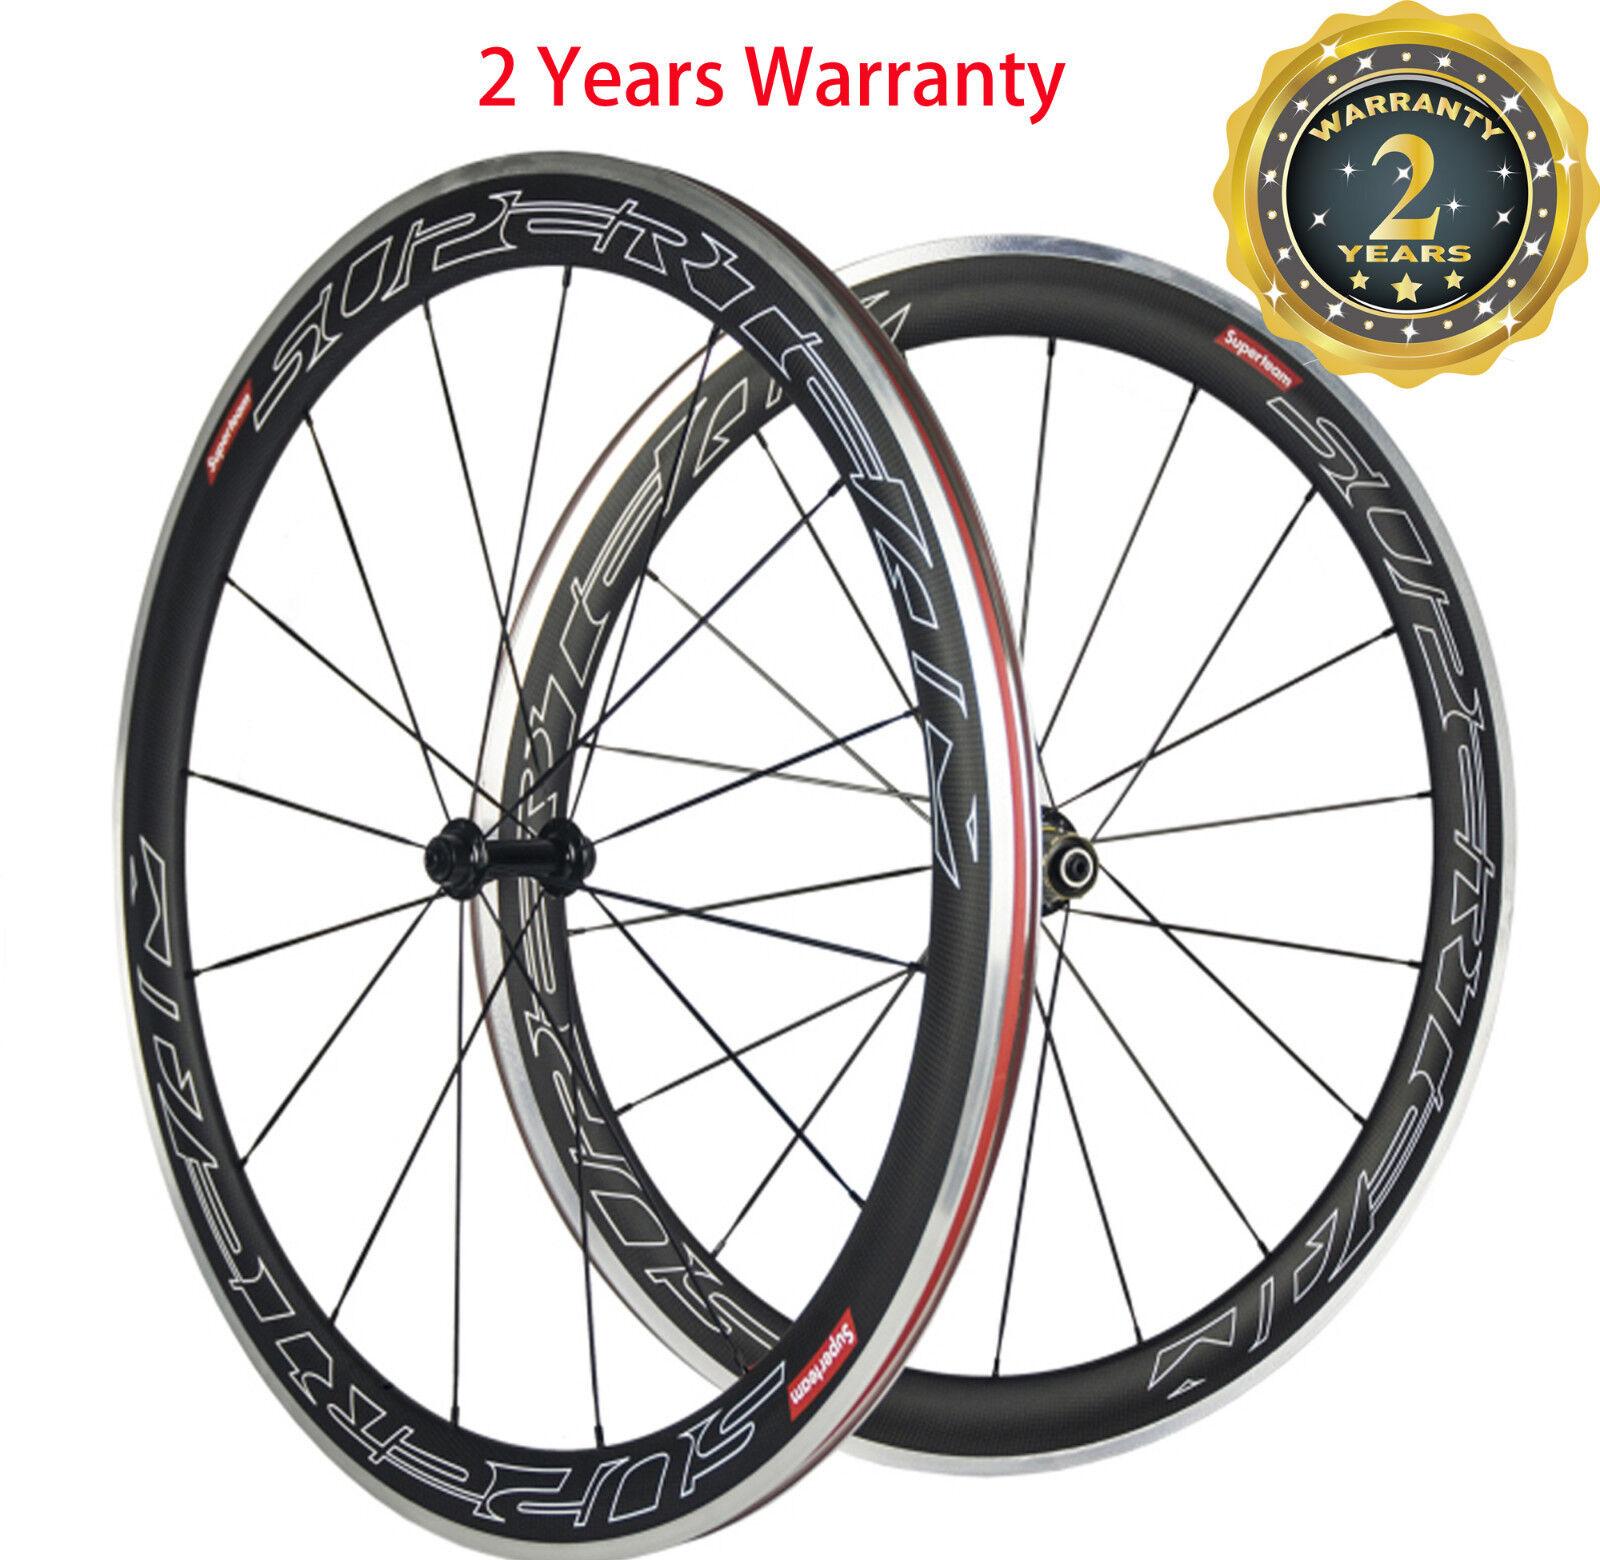 Superteam 700C  60mm Clincher Road Bike Wheelset Aluminum Braking Carbon Wheelset  hastened to see